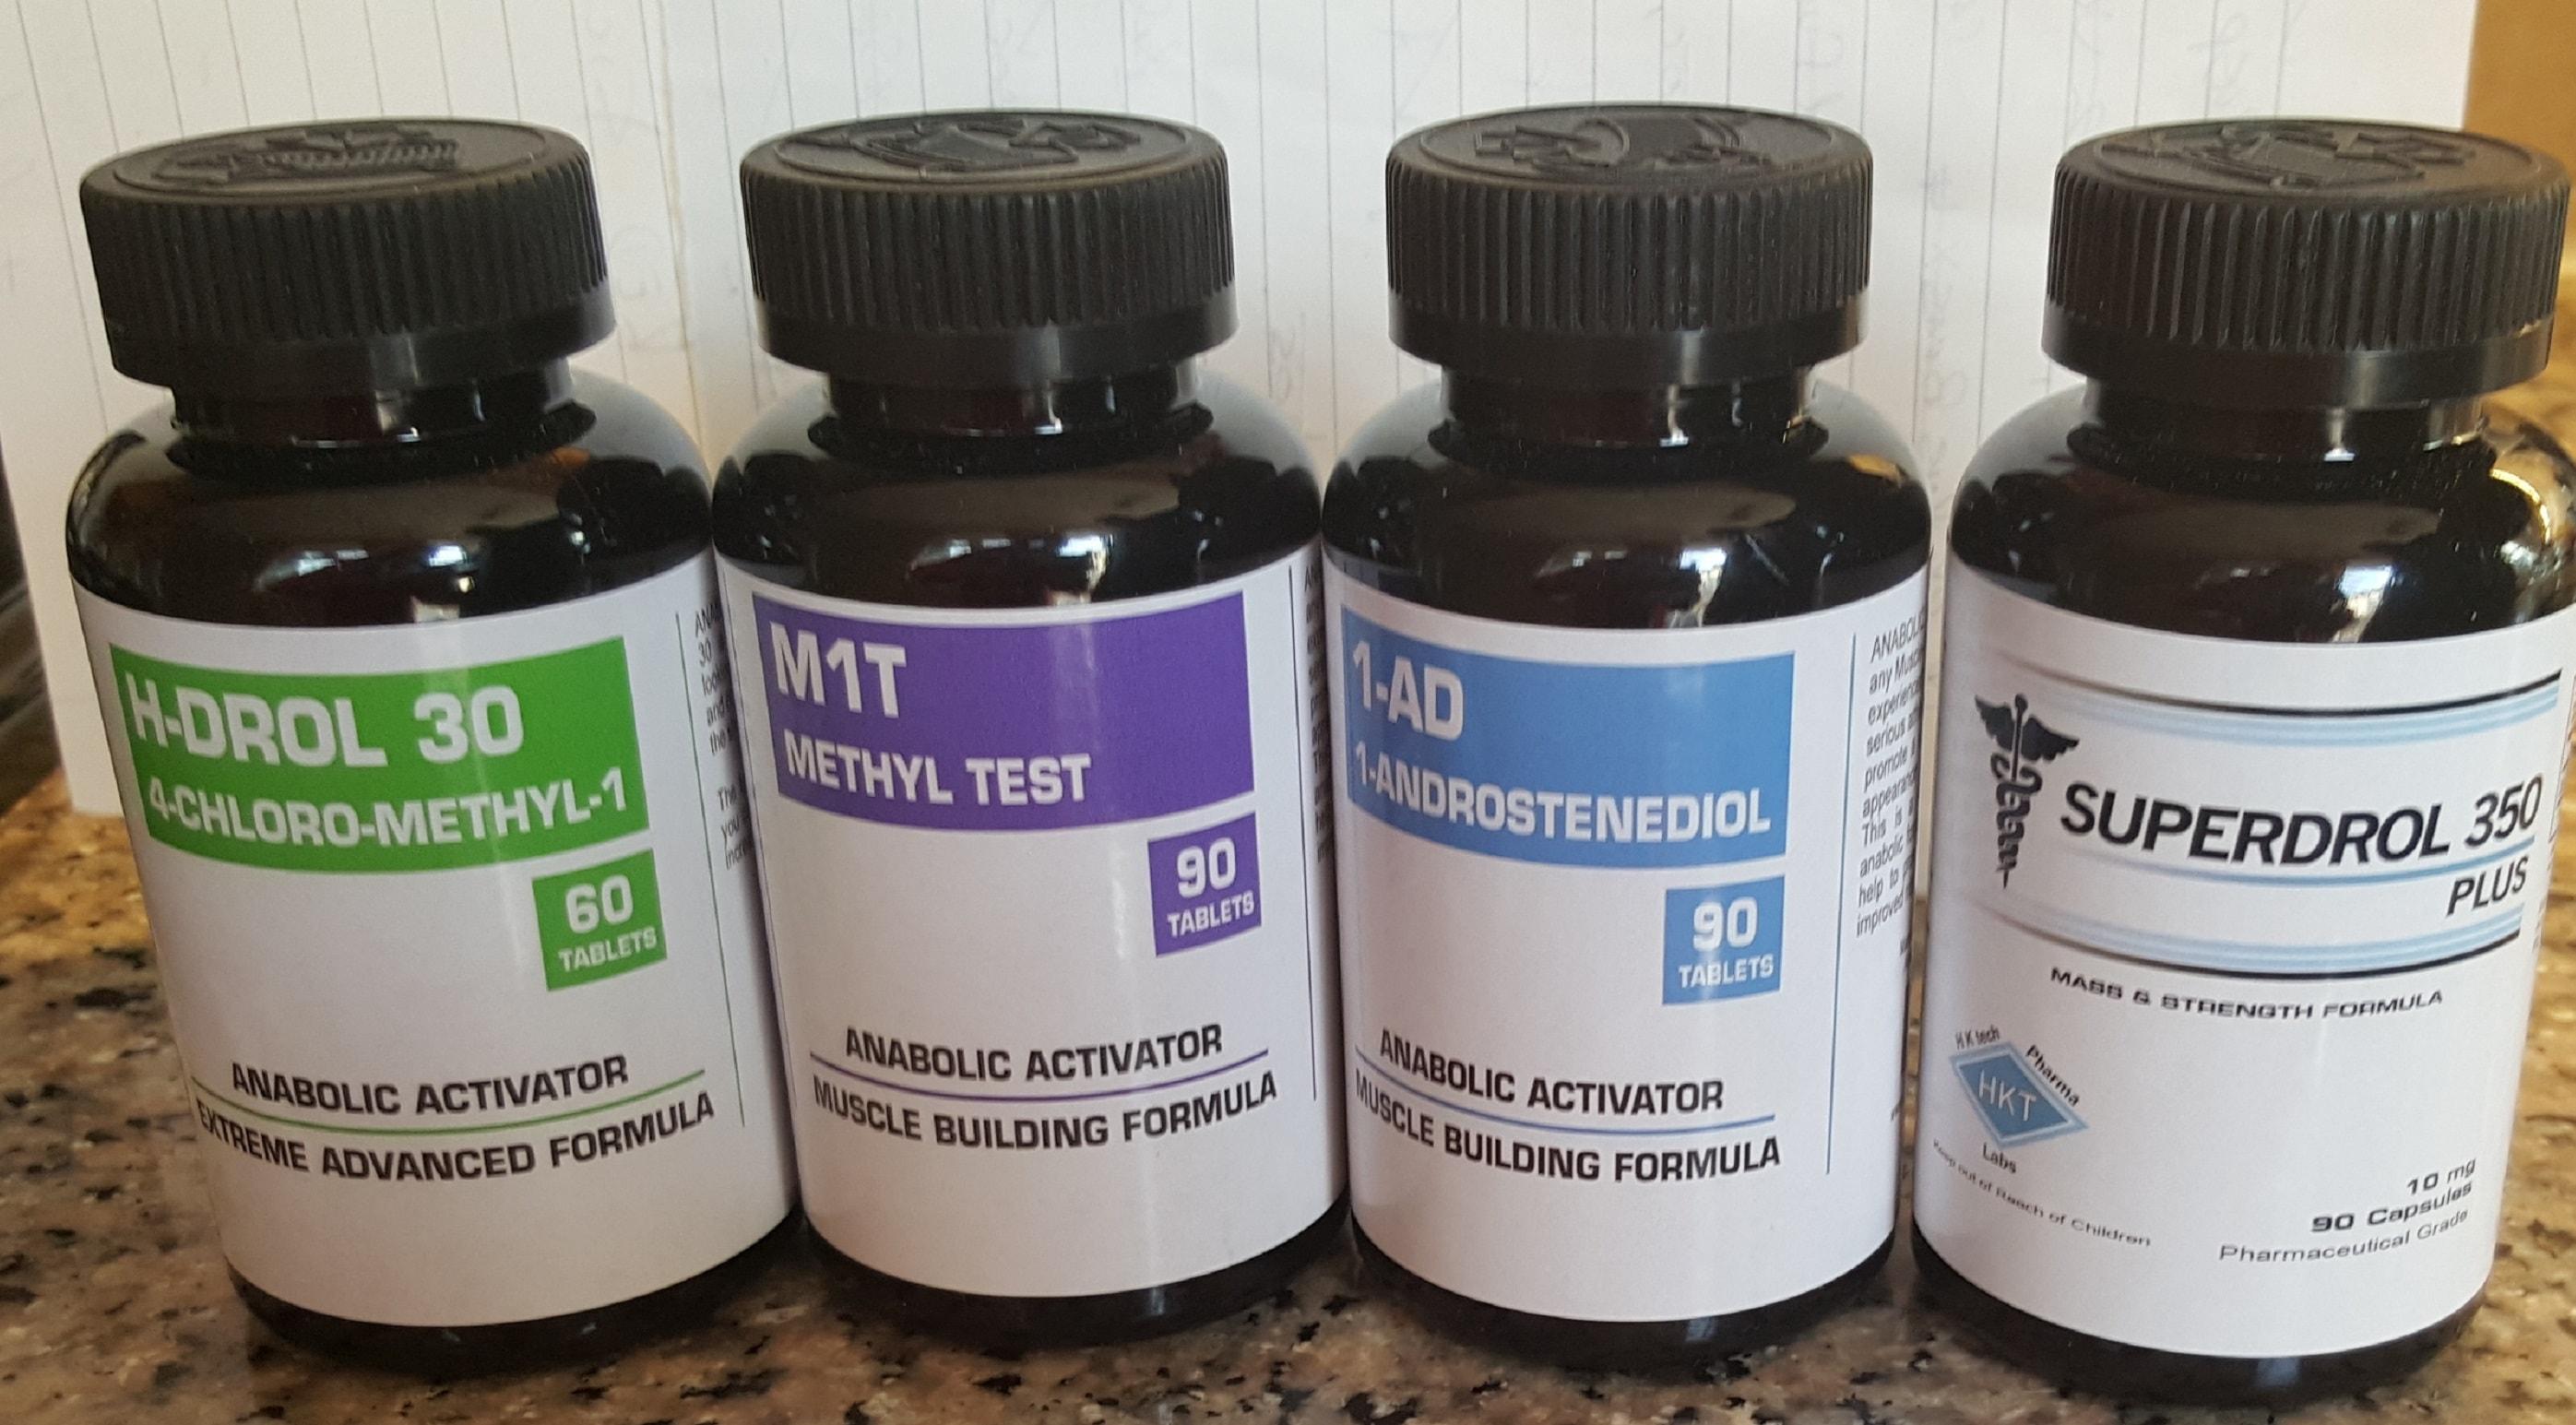 Прогормоны: H-DROL 30, M1T. 1-AD, SUPERDROL 350